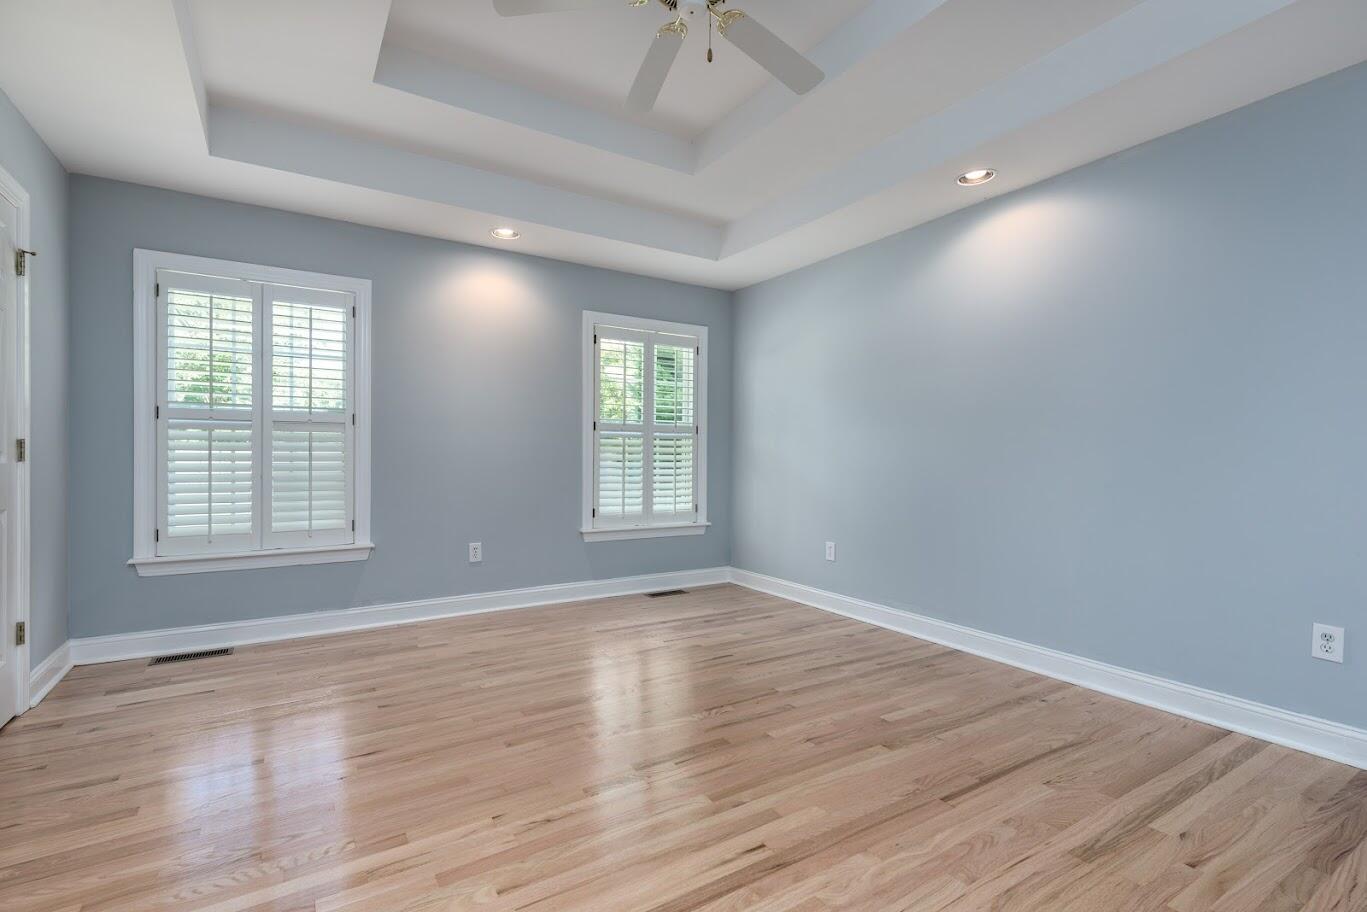 Lakeshore Homes For Sale - 1445 Waterside, Mount Pleasant, SC - 0